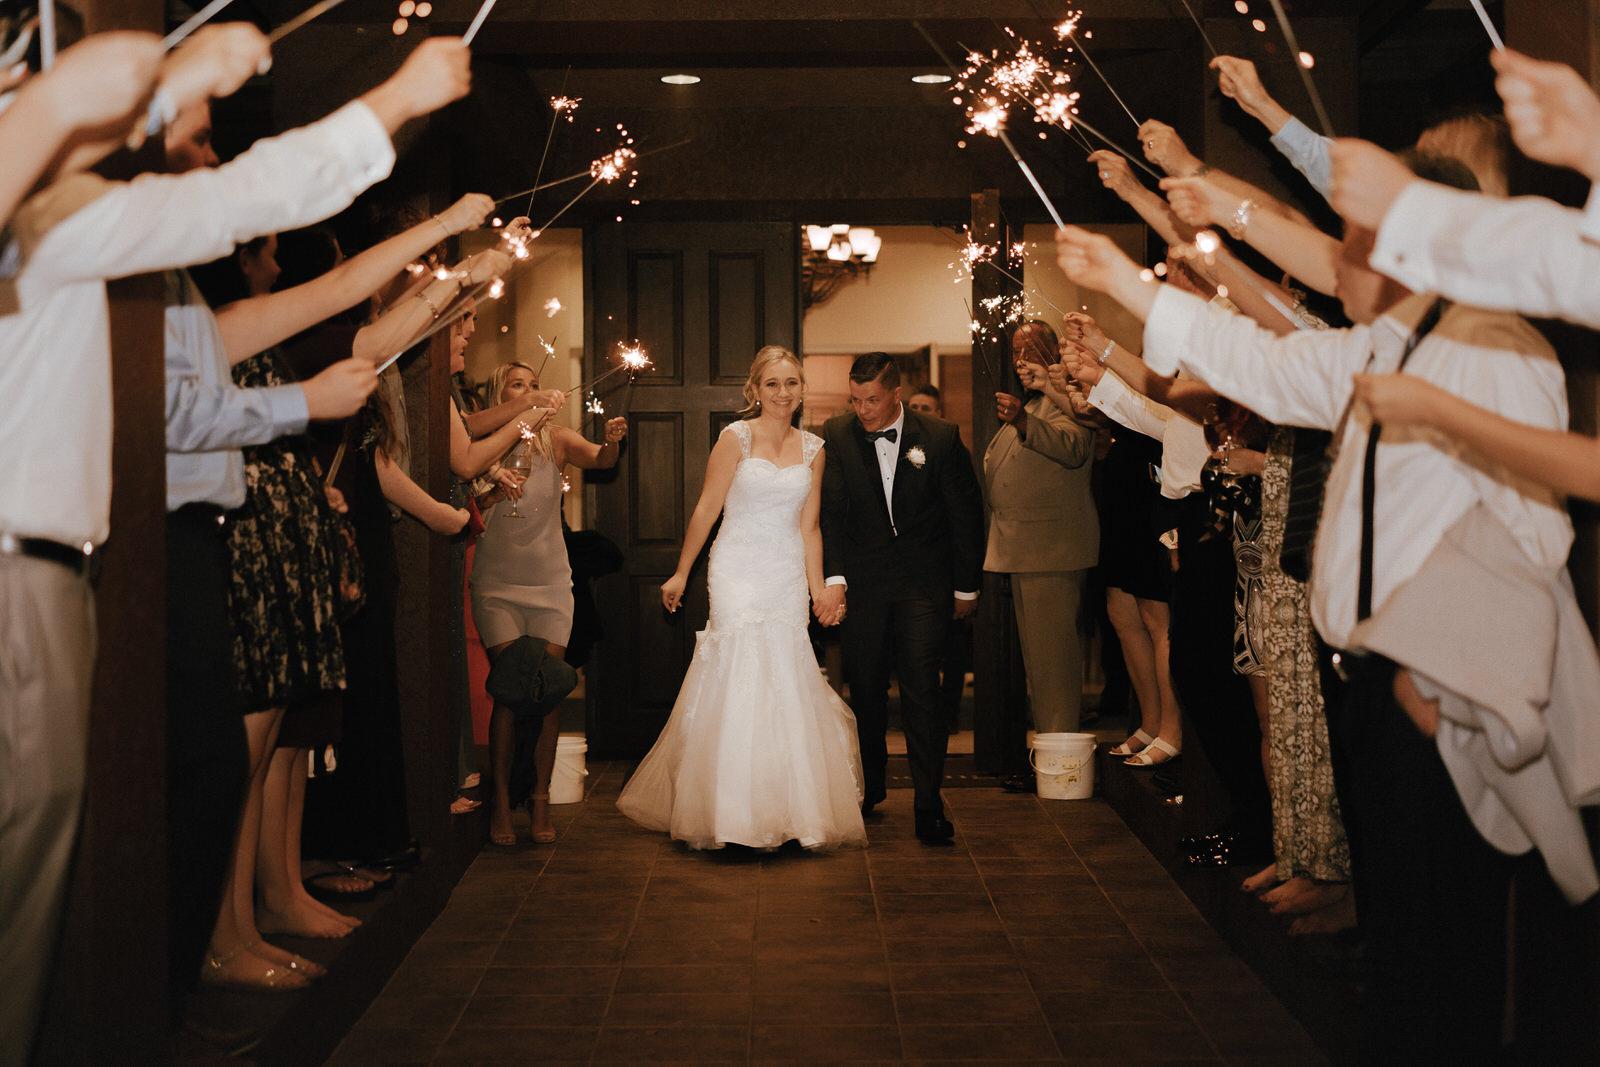 The Landings-Fort Myers Wedding Photographer- Nick and Jessica-689.jpg